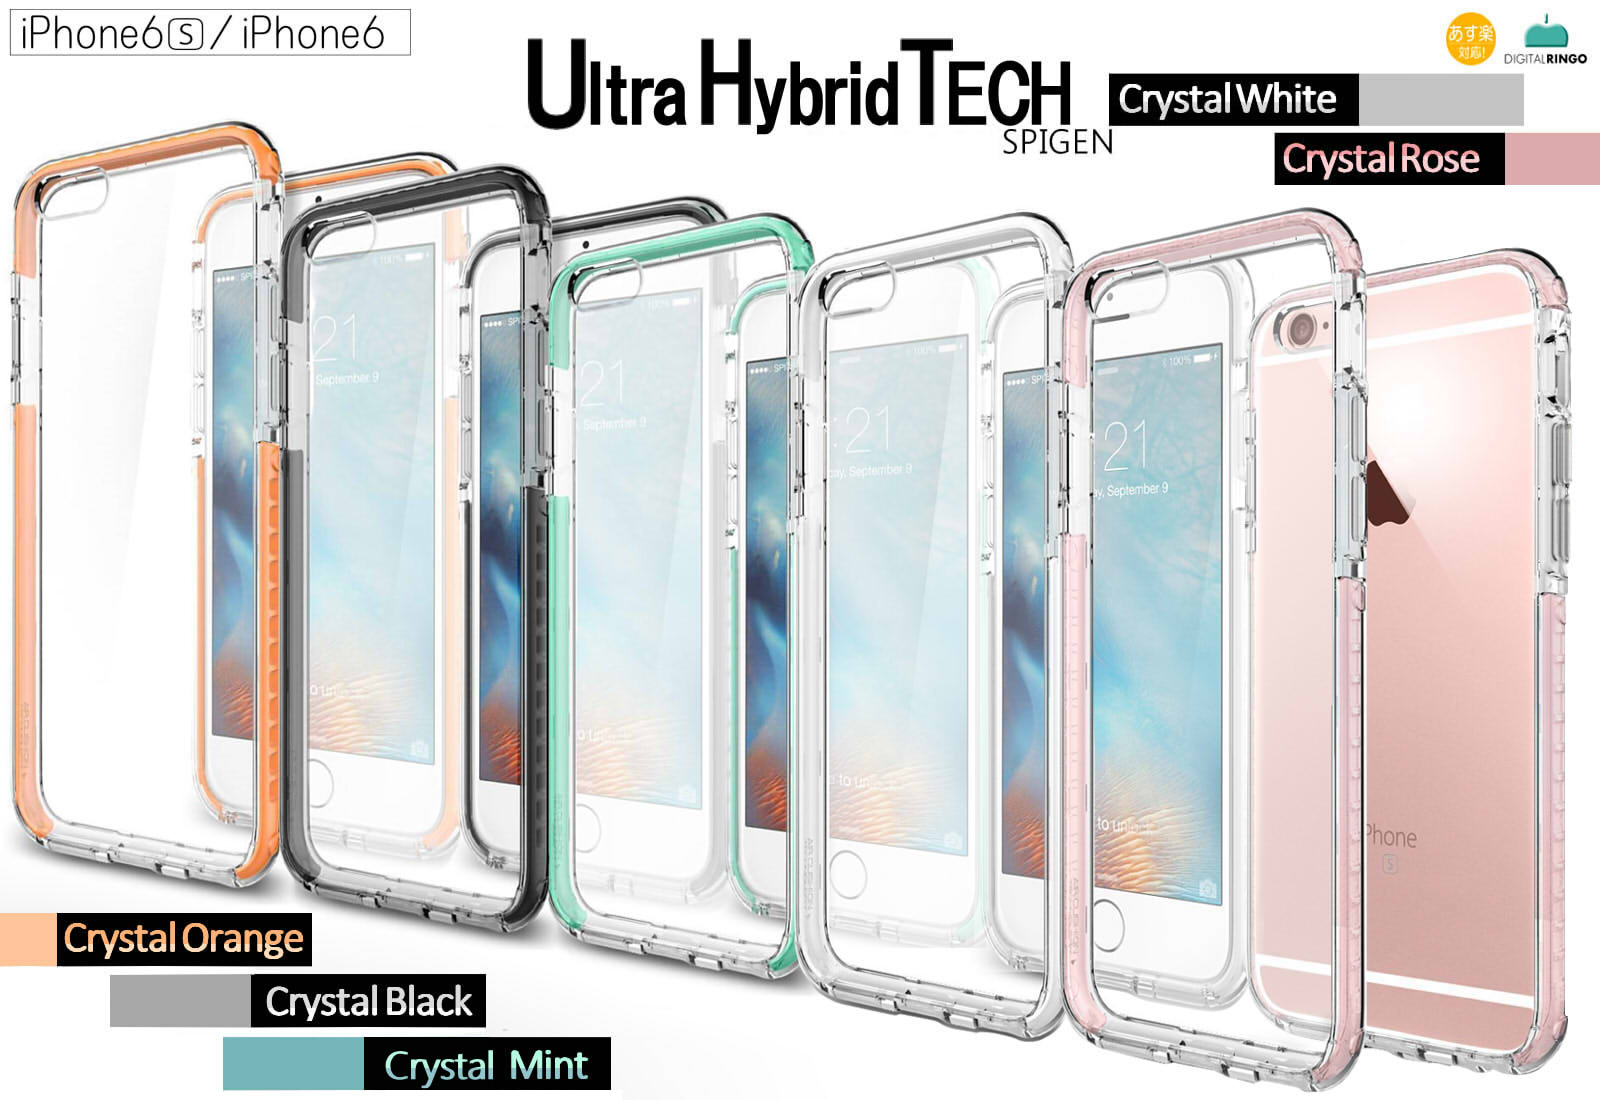 Spigen iPhone6s/6 Ultra Hybrid Tech 国内正規品 あす楽対応 SPIGEN SGP シュピゲン 米軍MIL規格取得 iphone6 ケース iphone6s ケース スマホケース カバー スマートフォン スマホカバー スマホ 衝撃吸収 耐衝撃 SGP11602 iphone6 ケース 頑丈 ミントグリーン